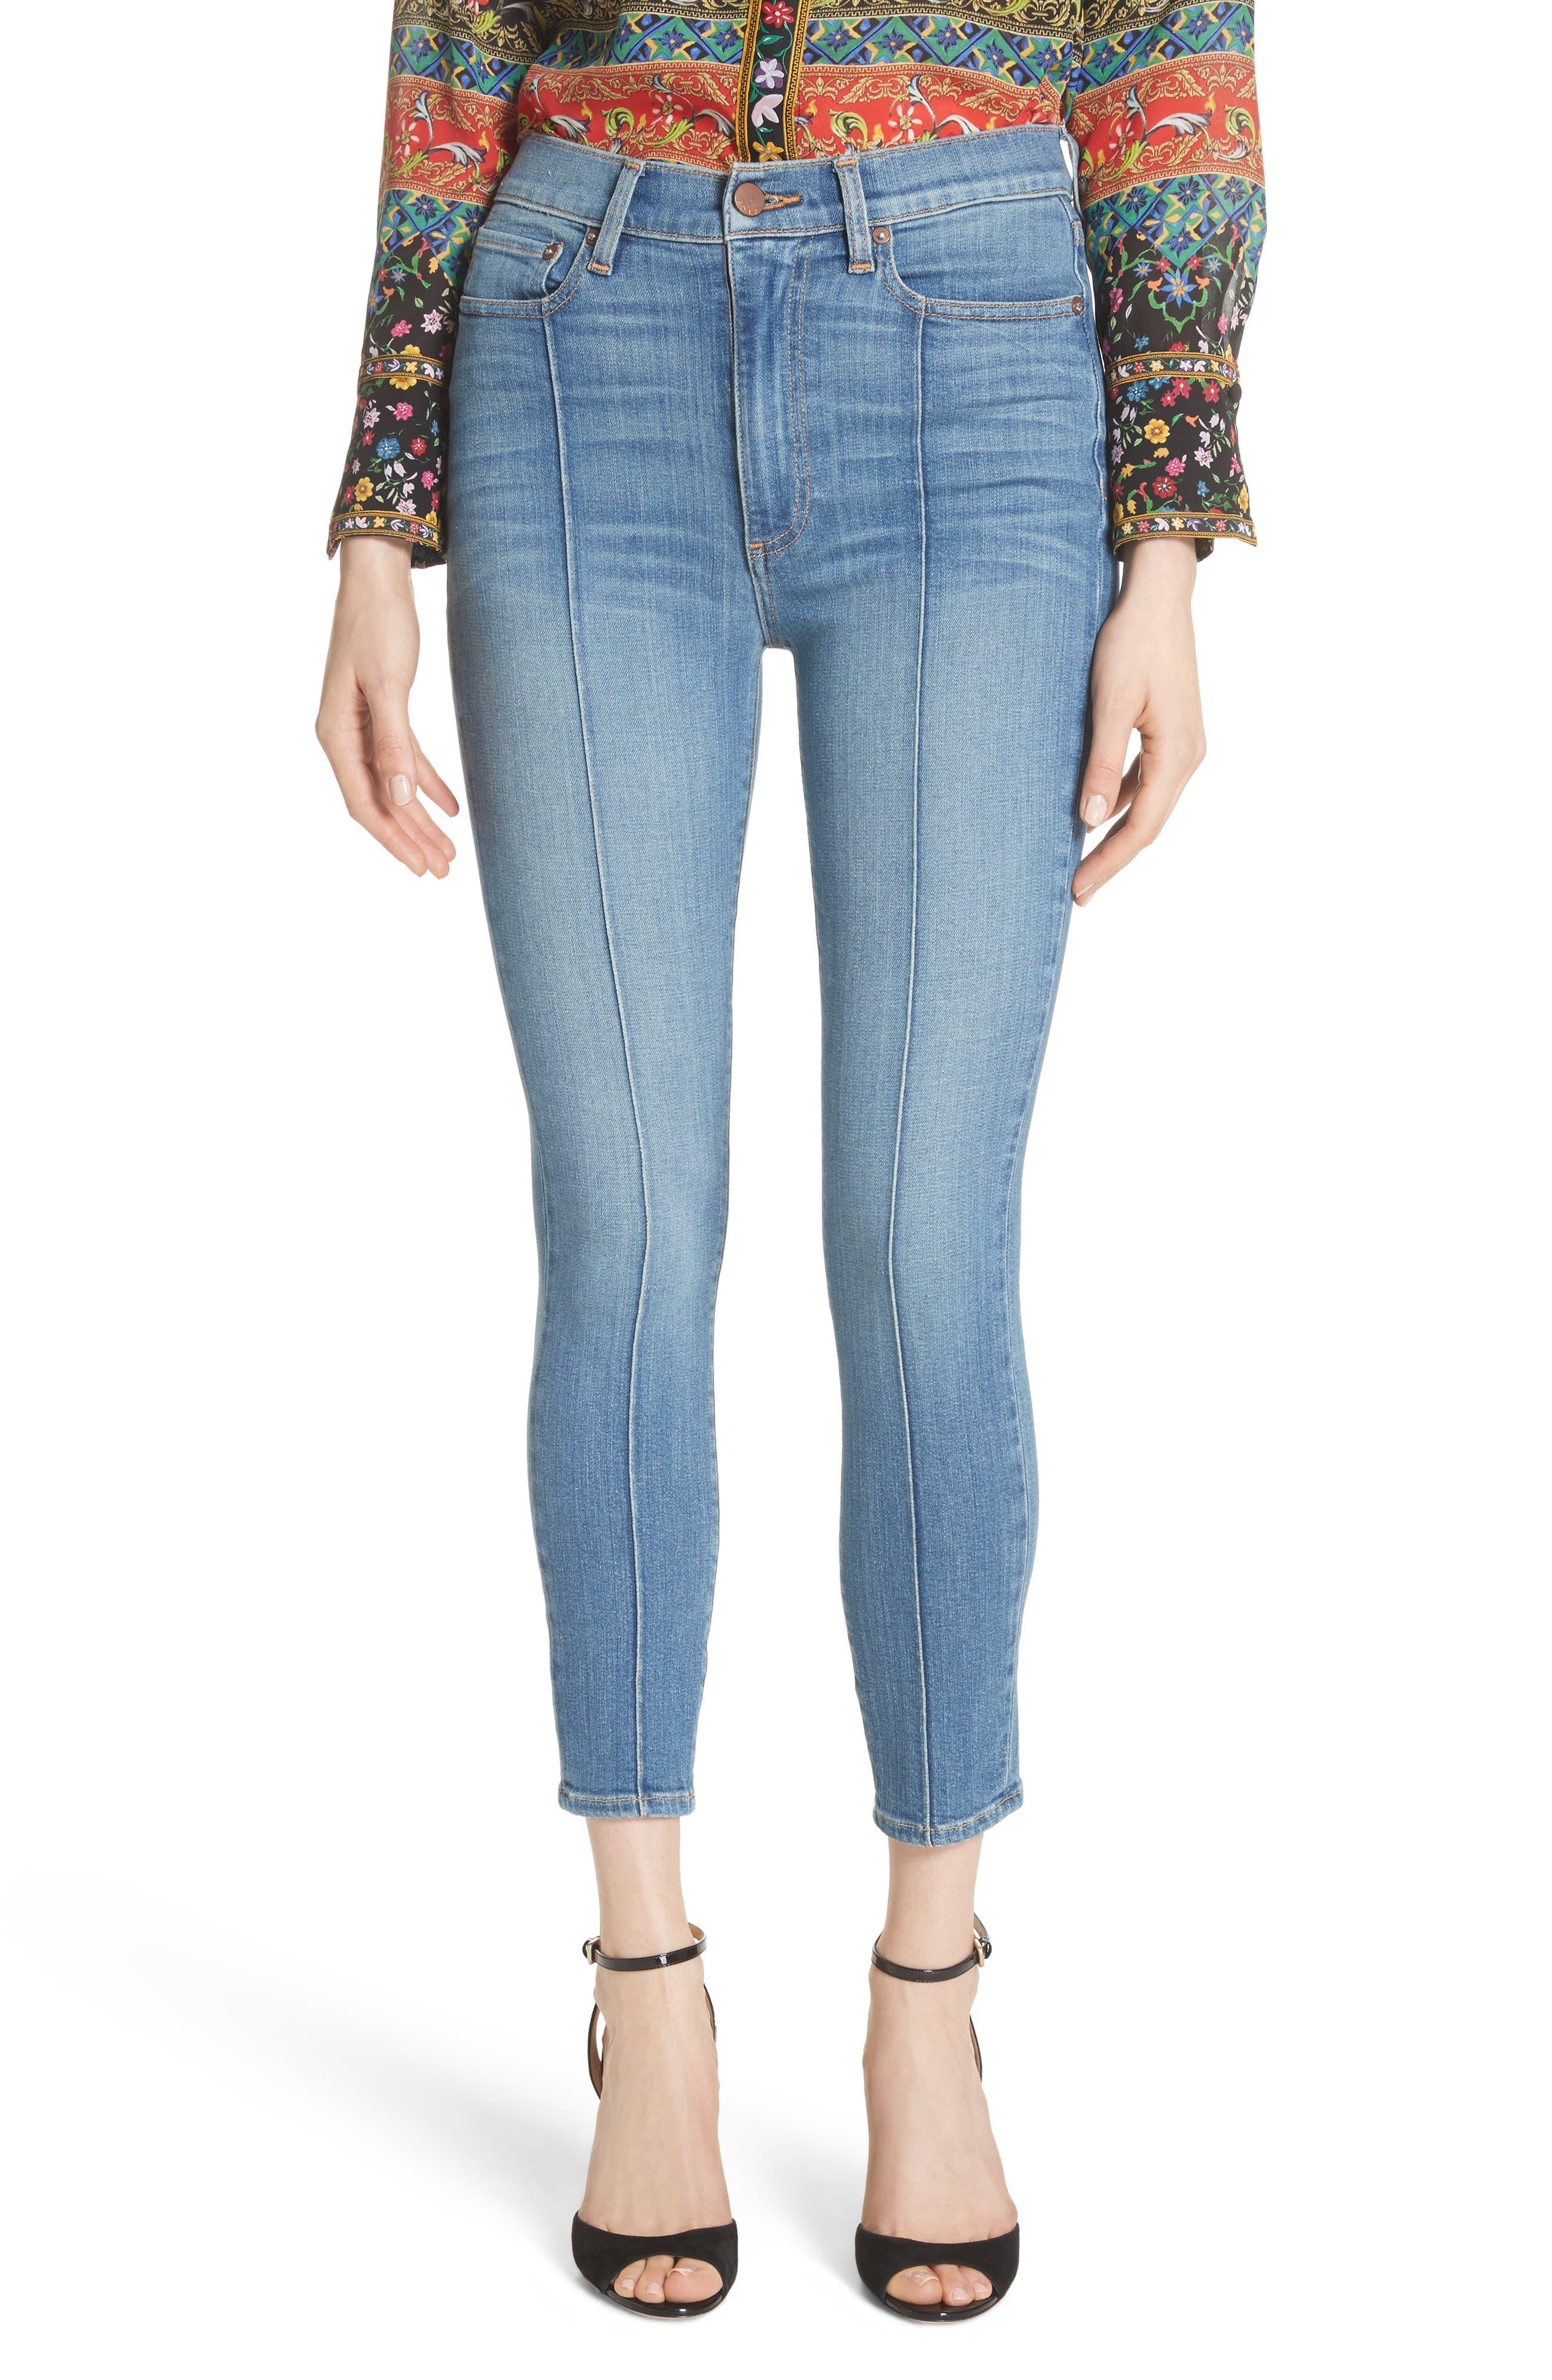 AO.LA Good High Waist Pintuck Skinny Jeans,                         Main,                         color, Roadhouse Blues